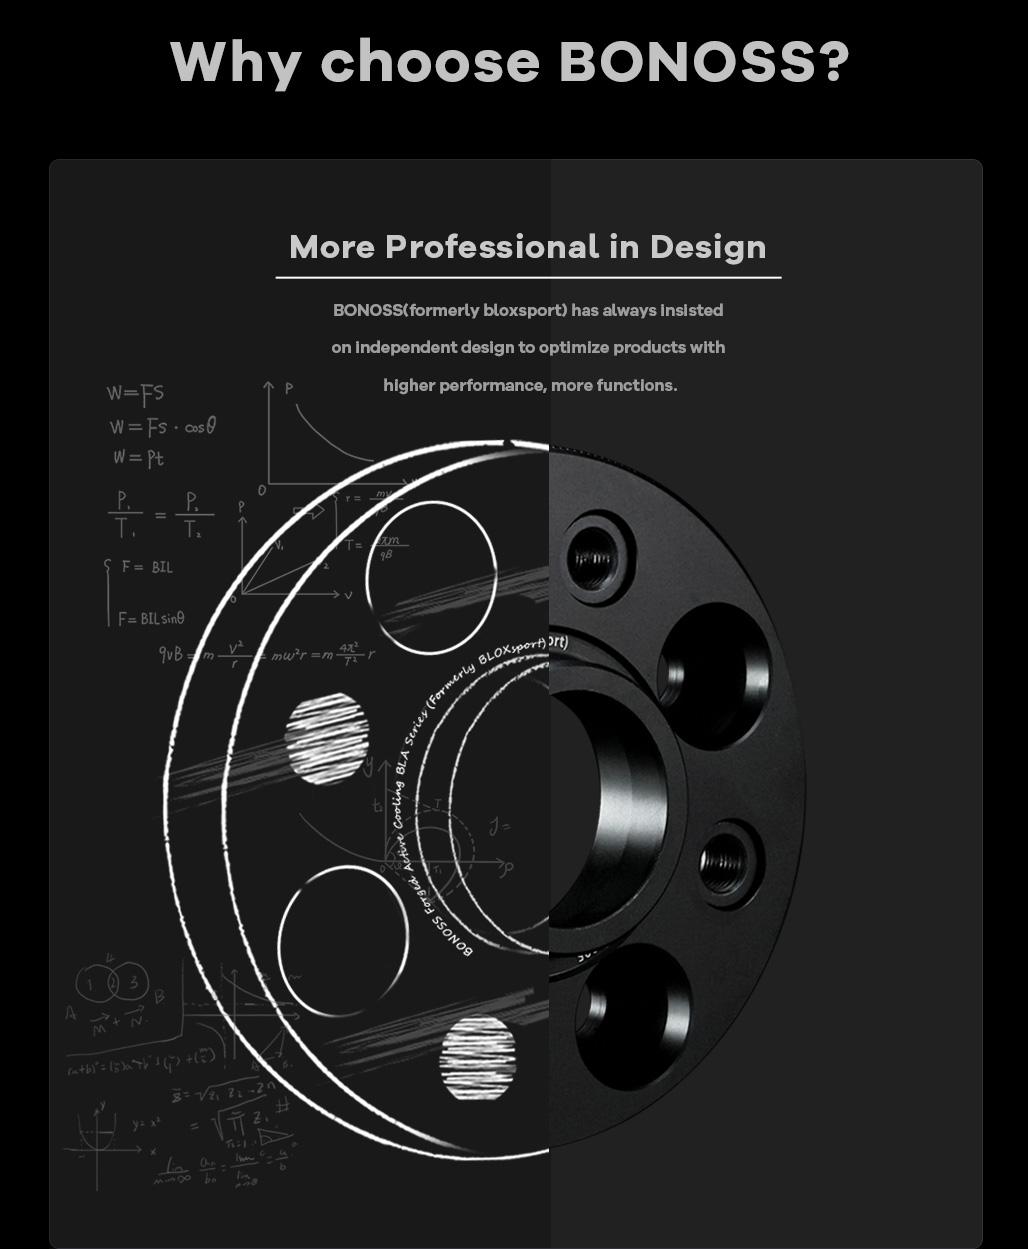 BONOSS-forged-active-cooling-4-Lug-wheel-spacers-(custom-wheel-spacers)-by-lulu-7.1